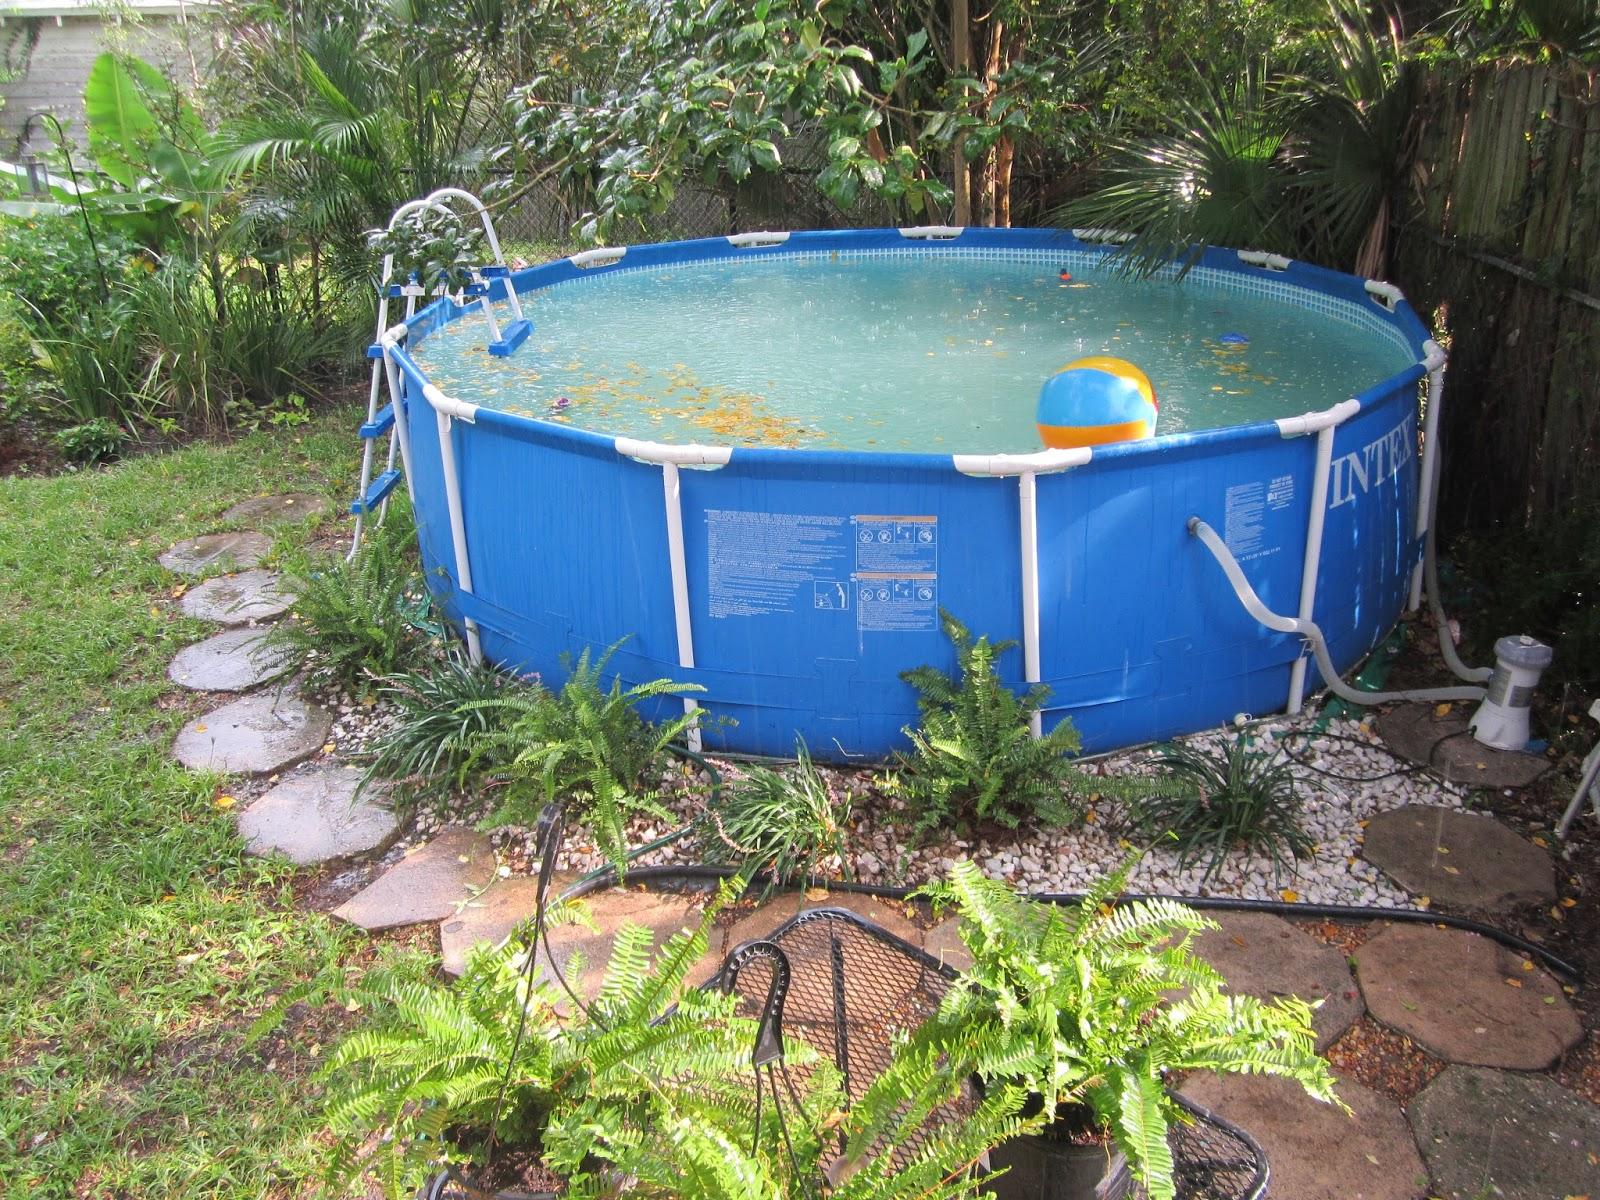 above ground pool landscaping ideas on a budget ... budget natures art design above ground pool landscaping ideas 10  unusual QIMQZAU